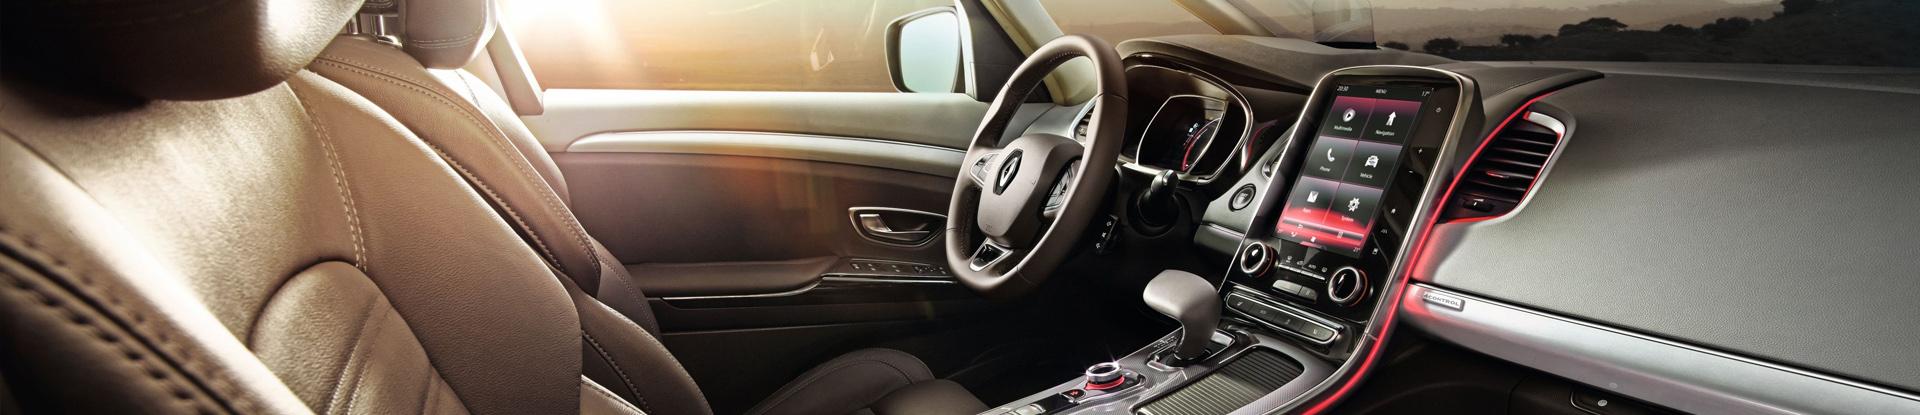 Innenraum Renault Espace